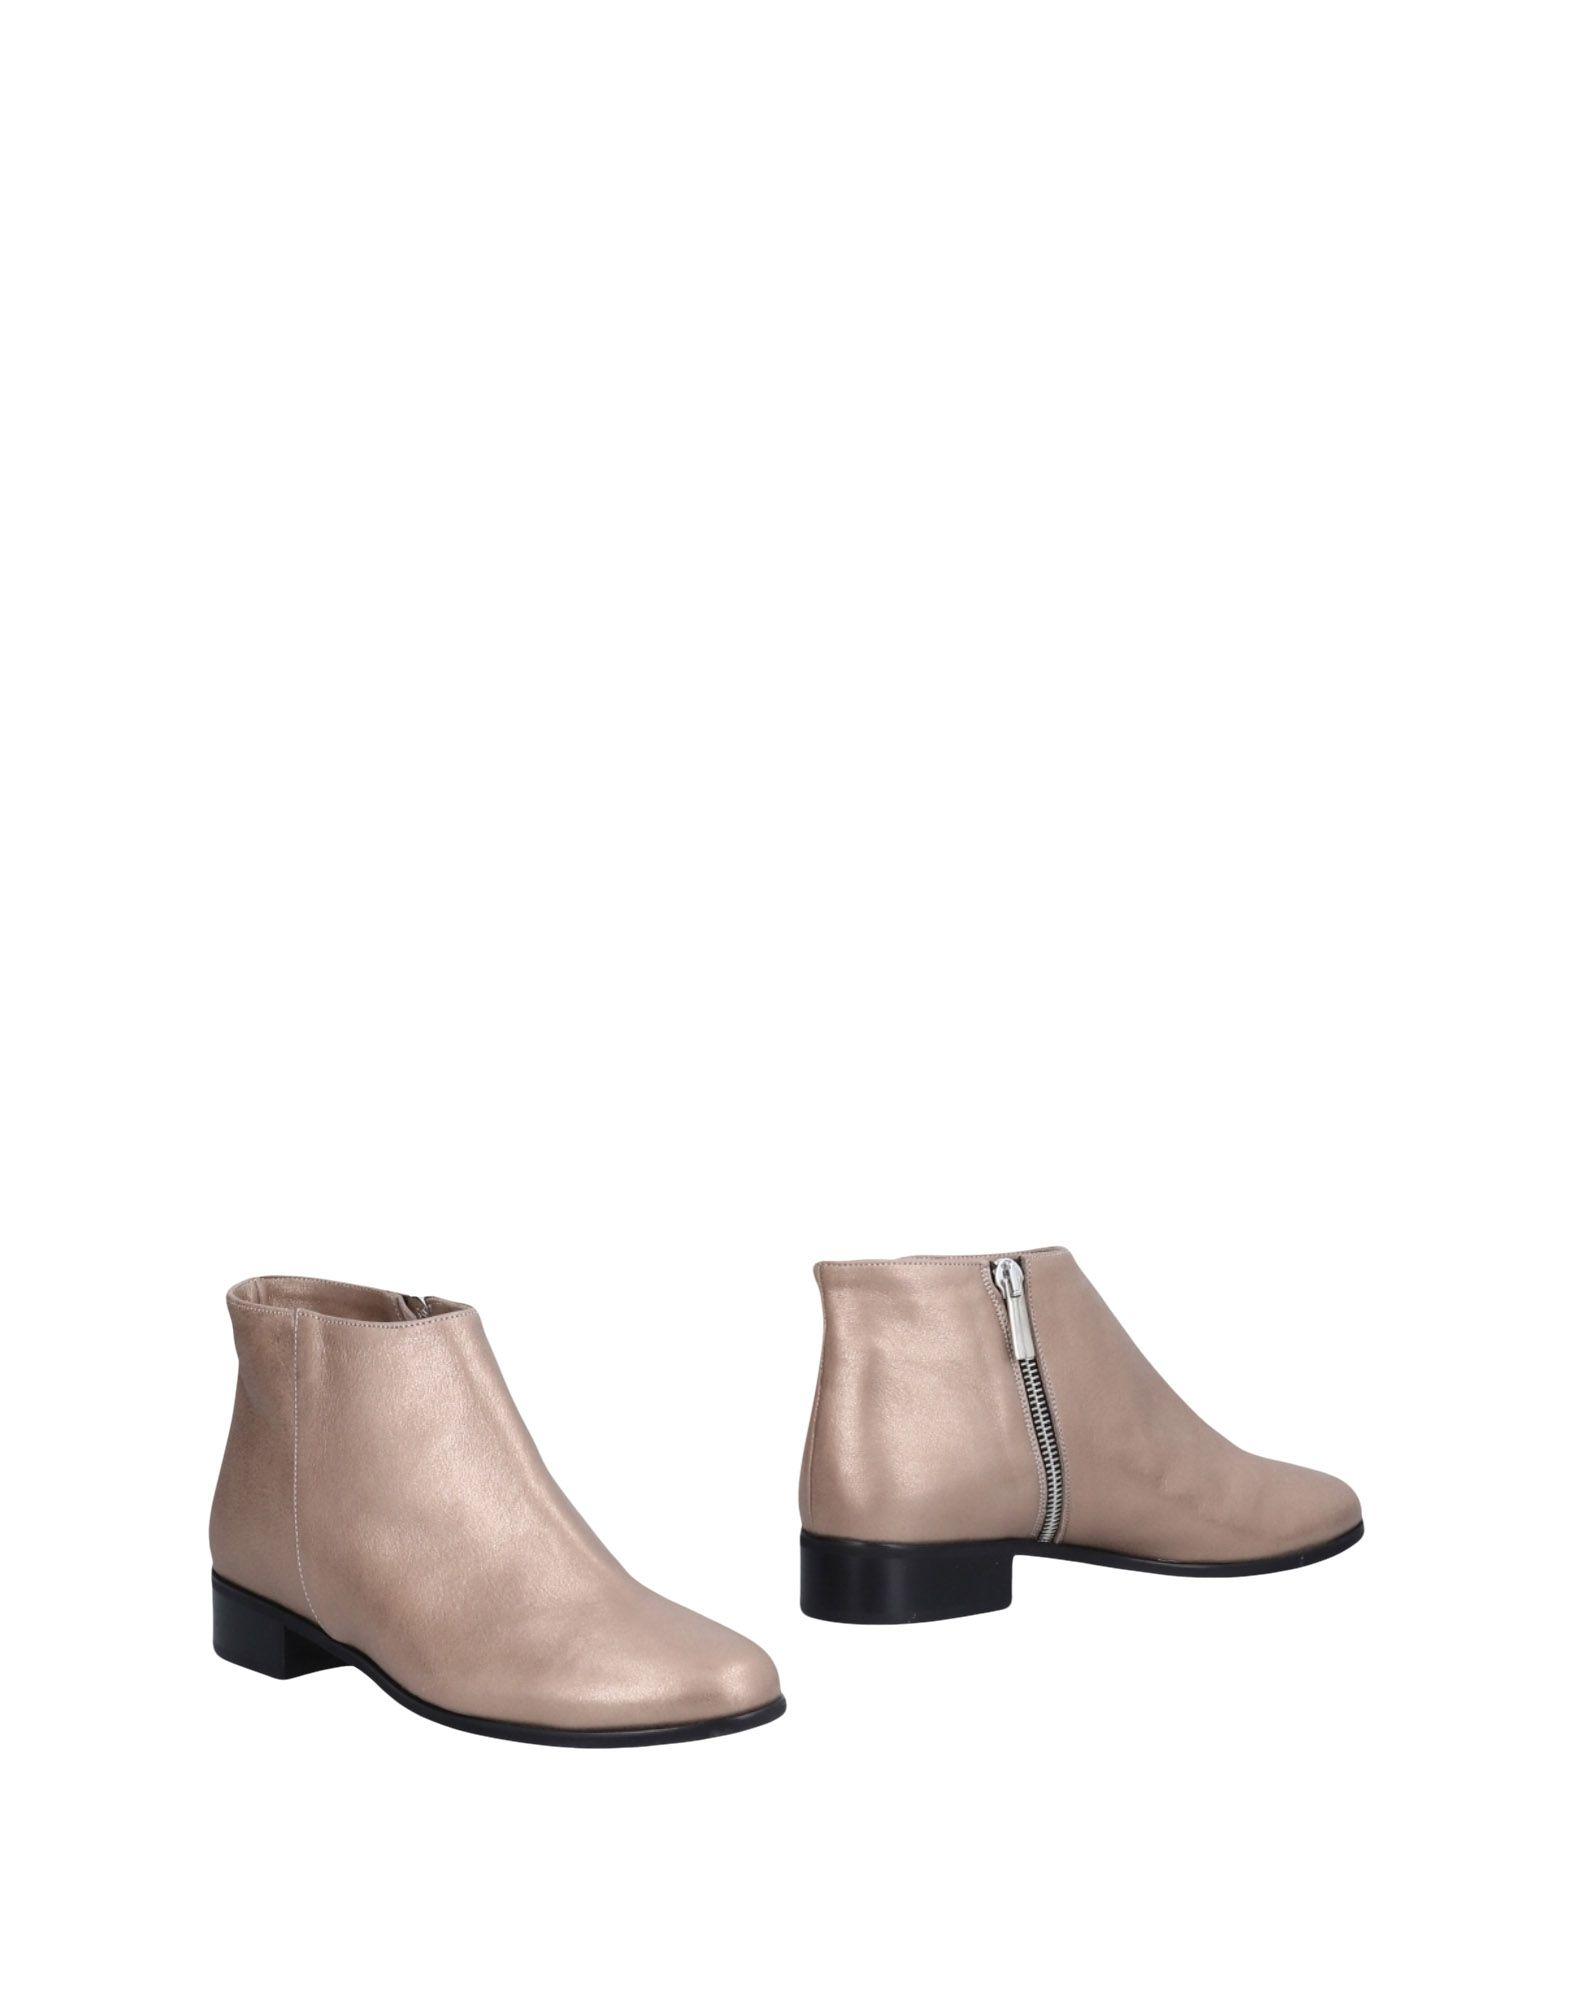 Haltbare Mode billige Schuhe Prezioso Stiefelette Damen  11491164IB Heiße Schuhe